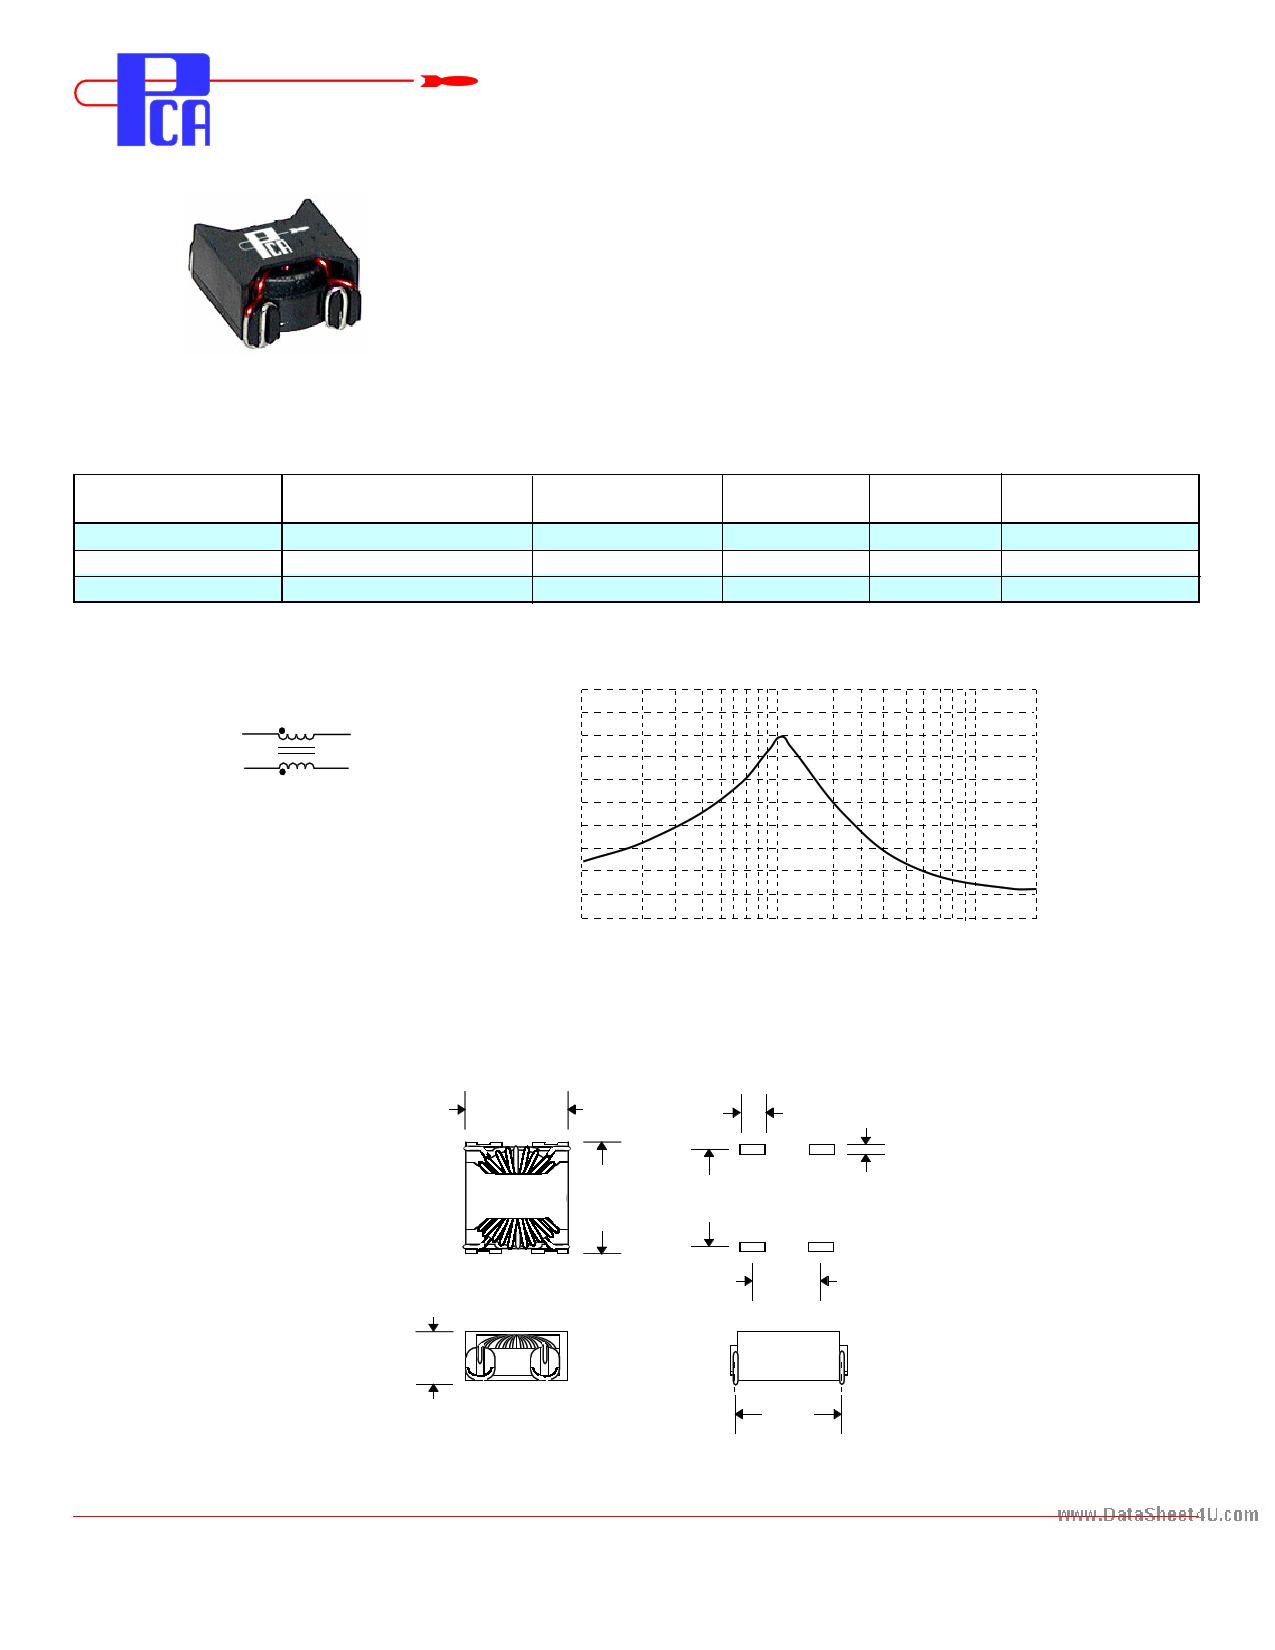 EPZ3001G دیتاشیت PDF